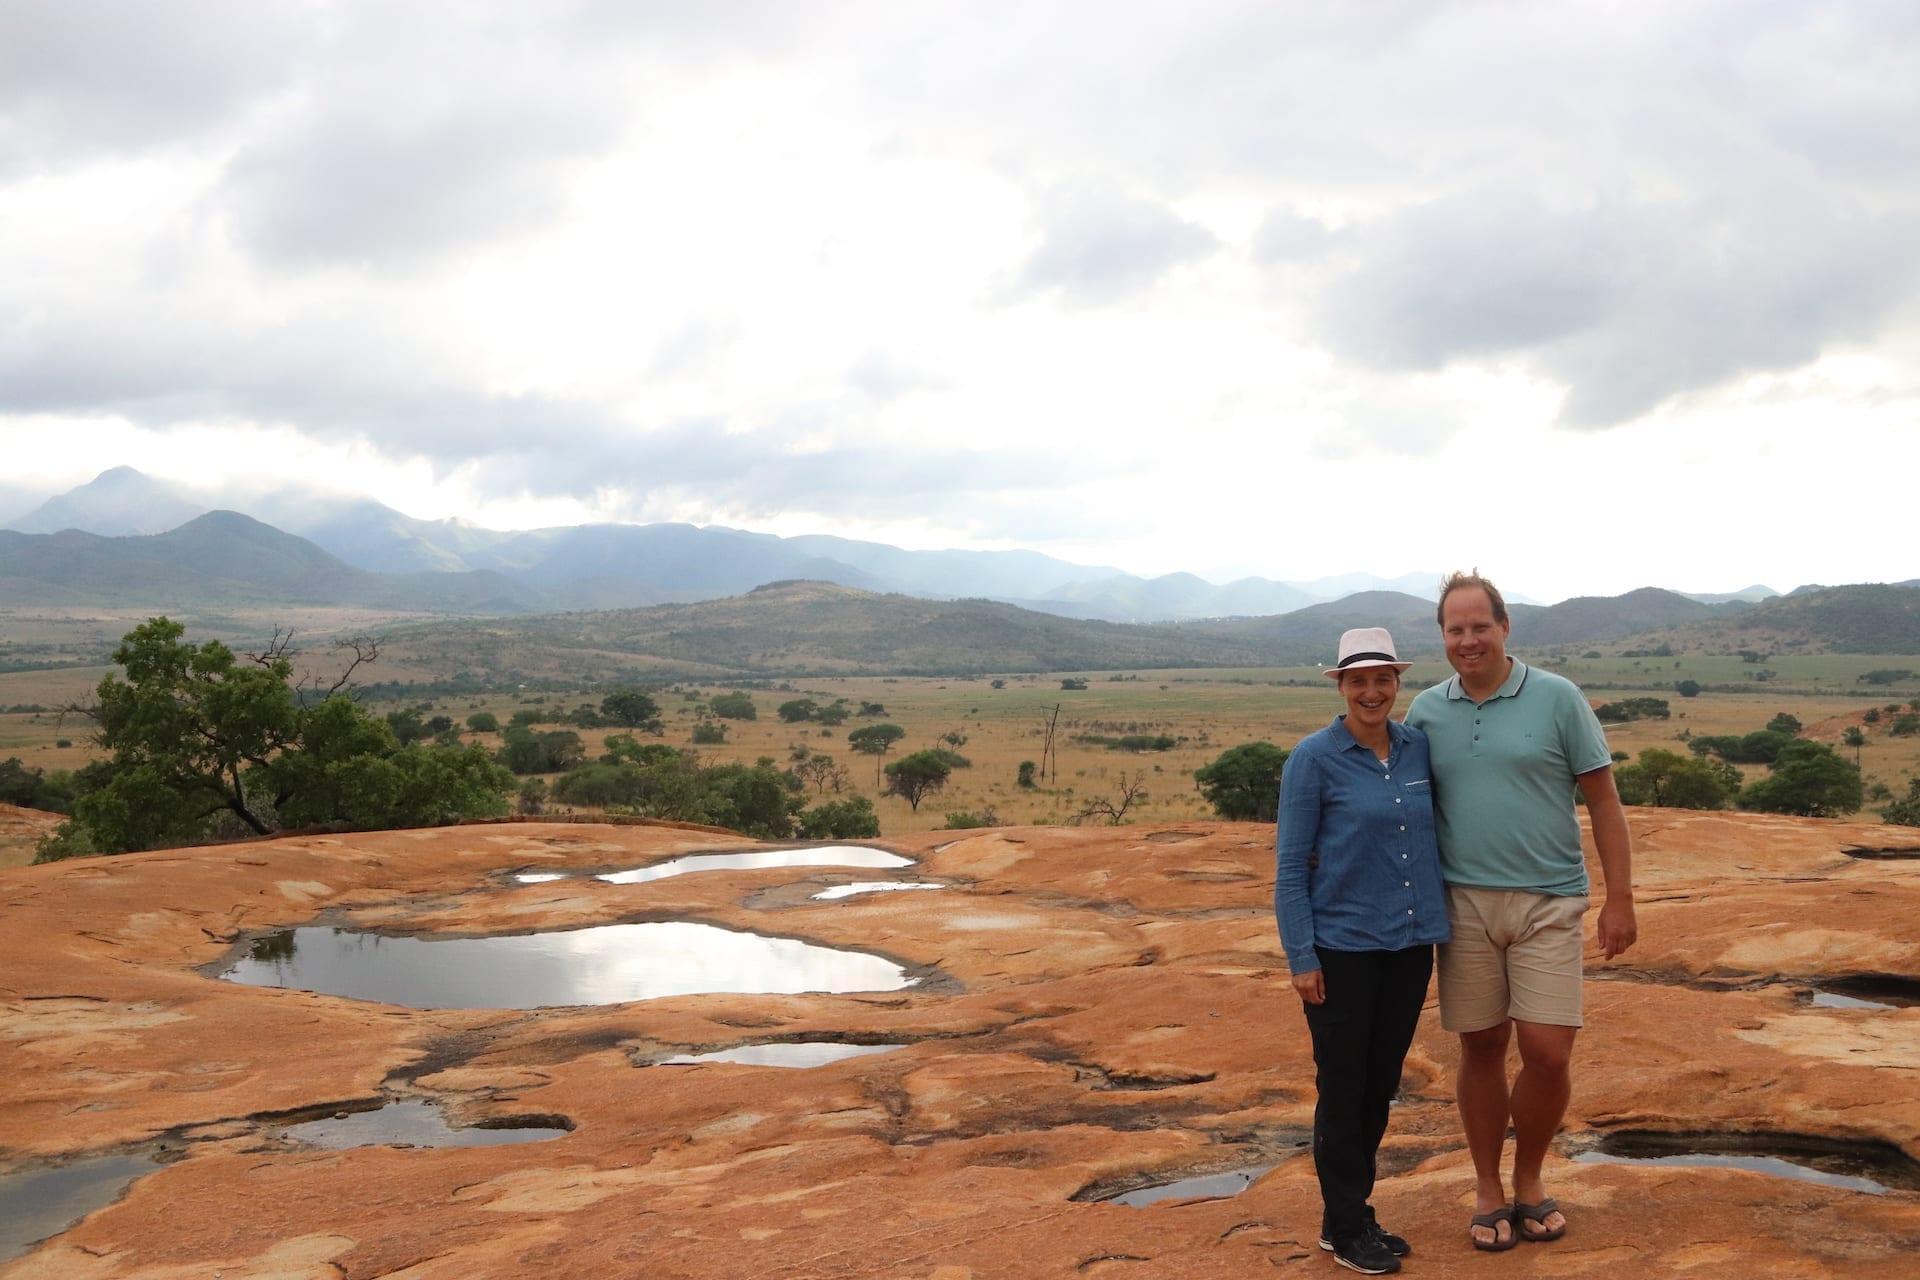 ALGEMEEN - ZA - Nkomazi Private Game Reserve